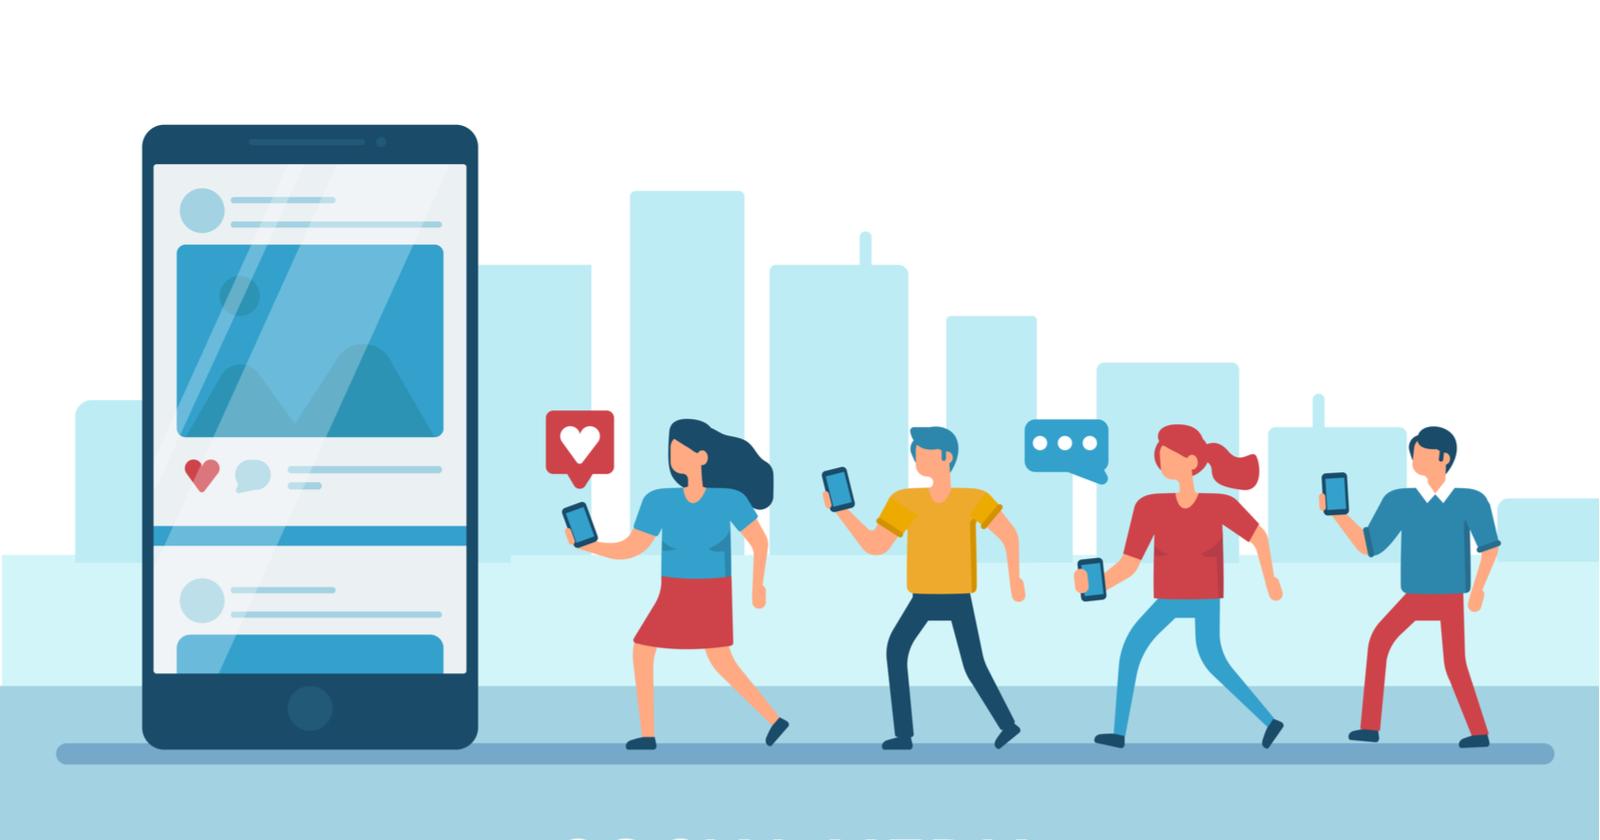 5 Reasons Why Having Social Media Presence is Important